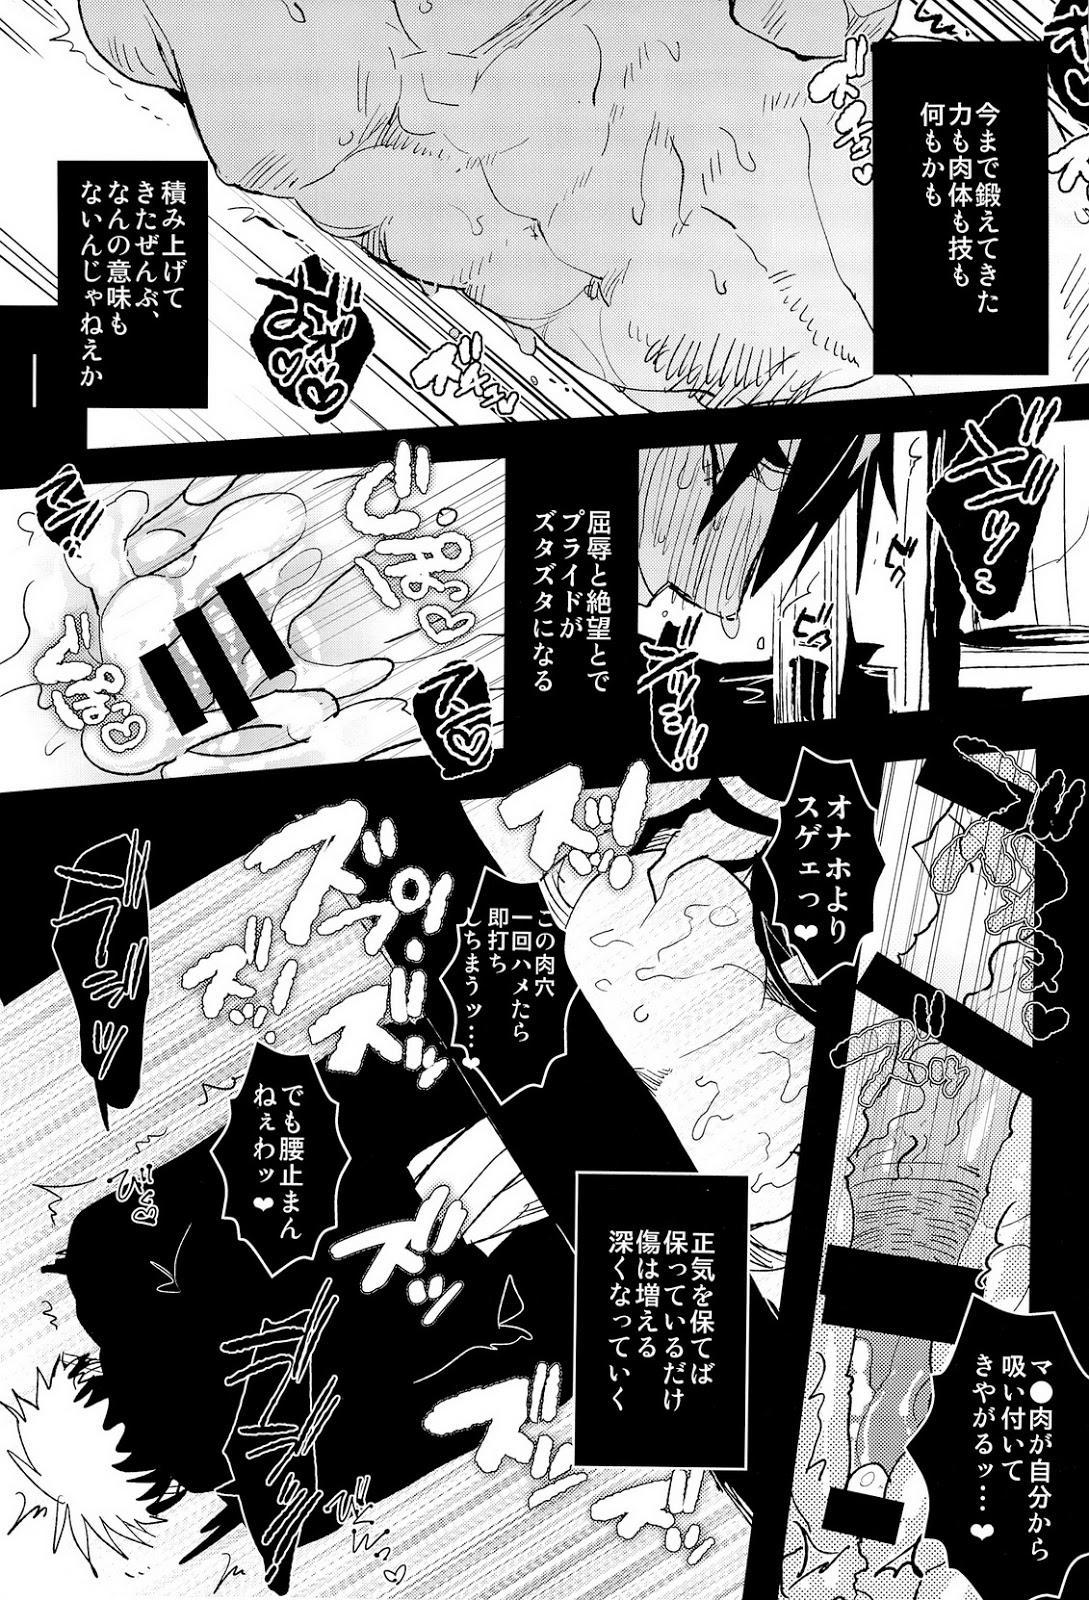 Kabejiri Hon - DK Fuck 16